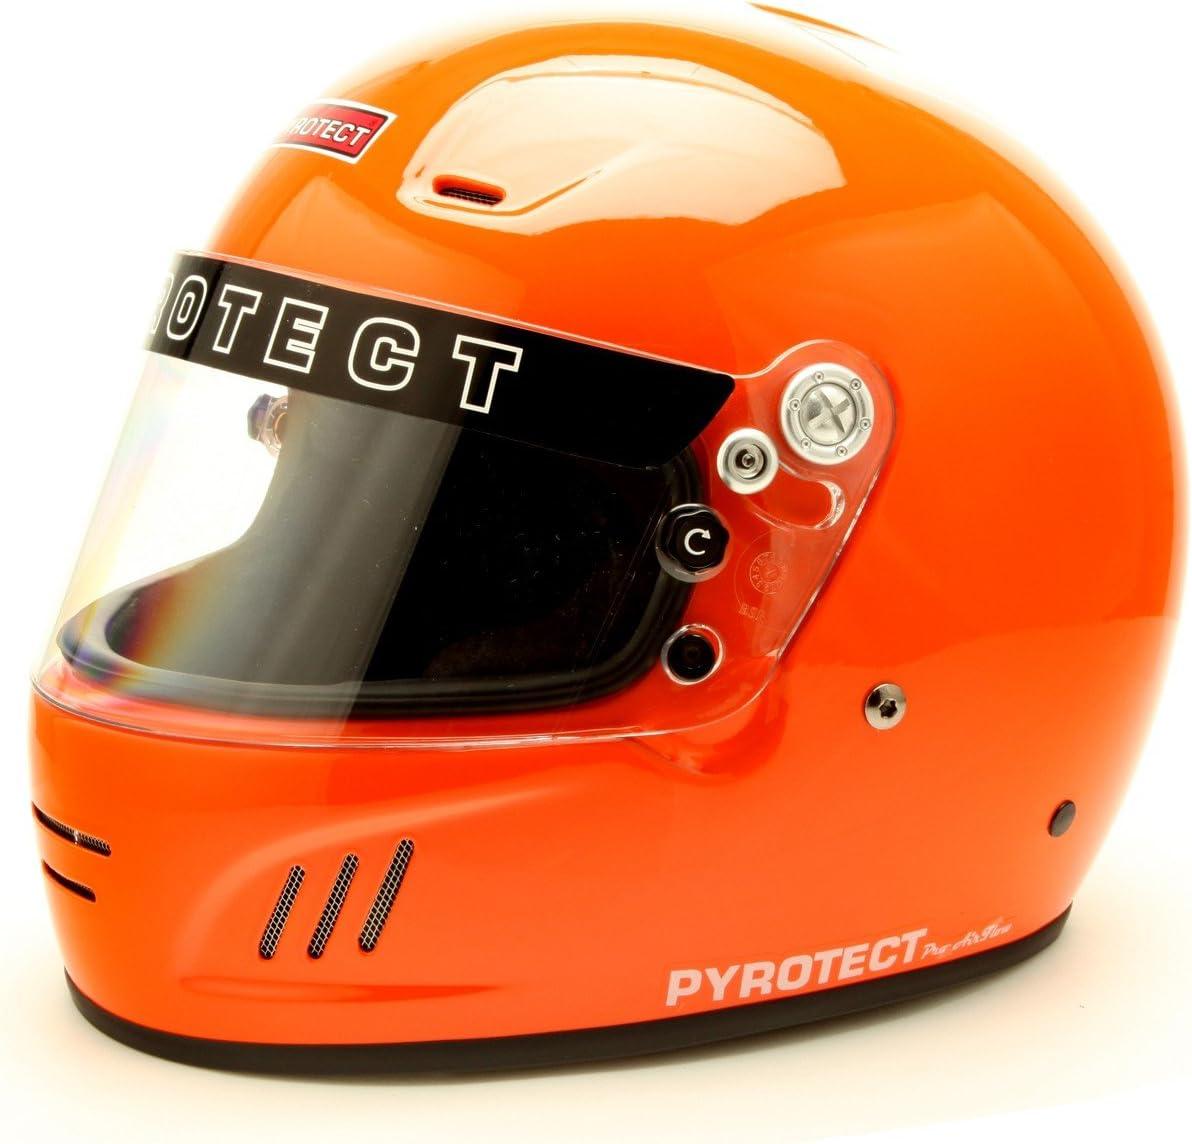 Pyrotect Helmet-Pro Airflow Full Face-Orange XXXL-9097005-SA2010